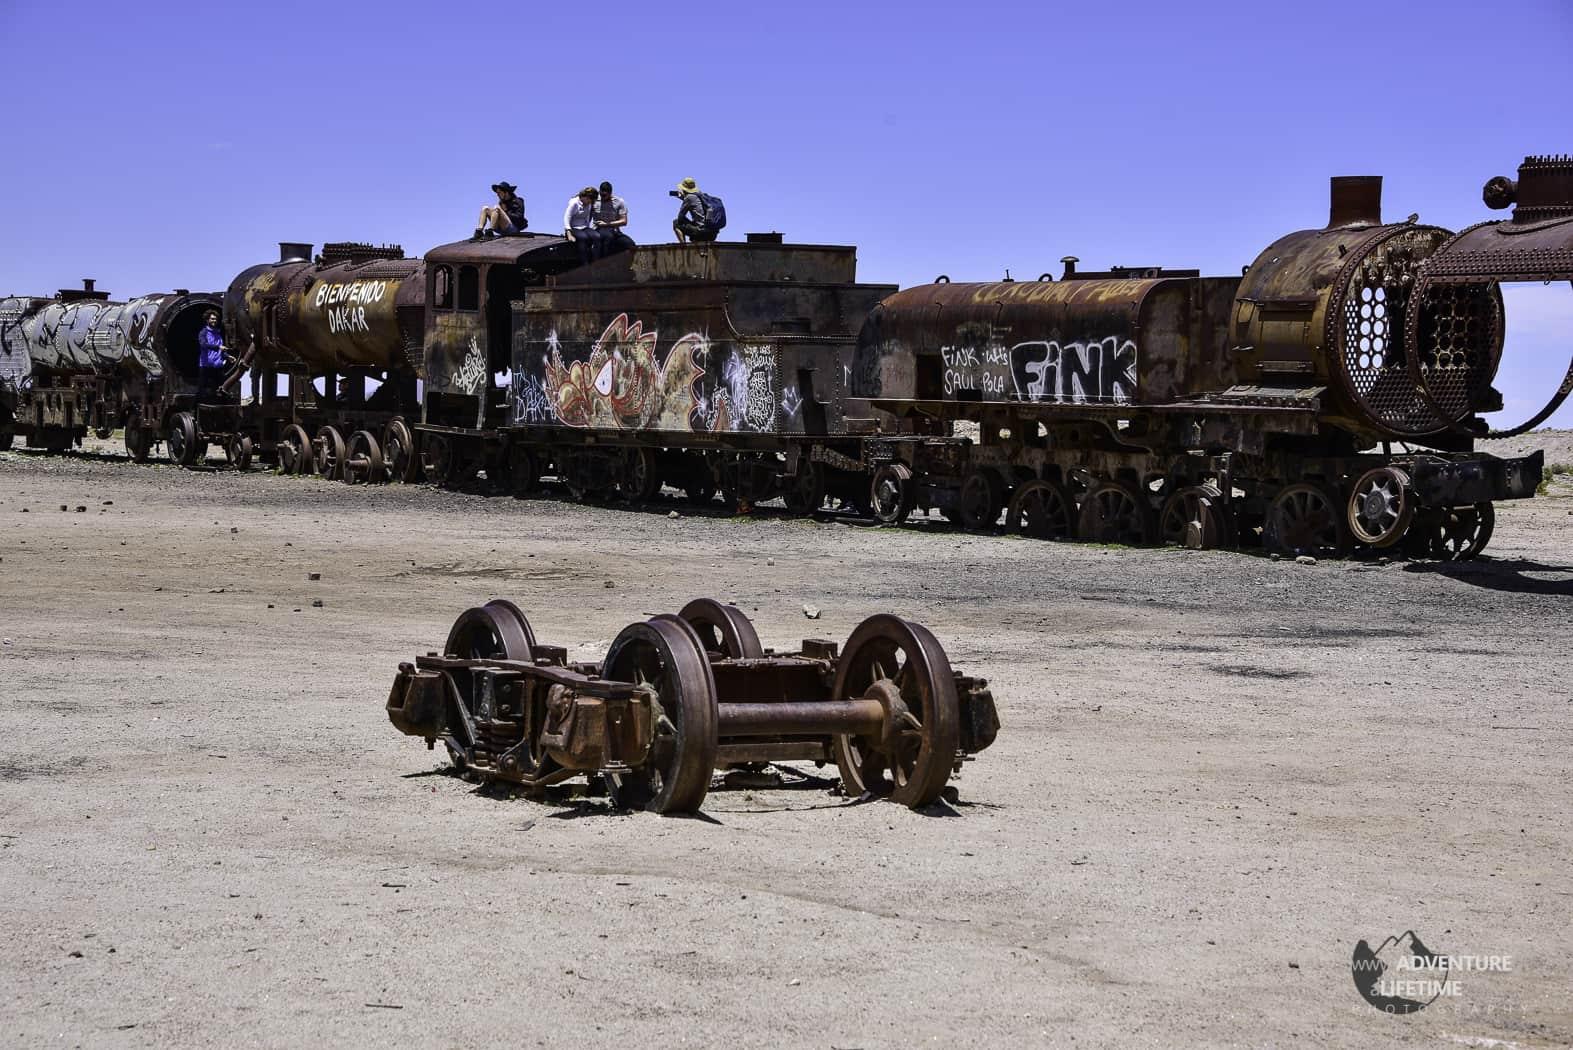 Train Graveyard in Uyuni, Bolivia